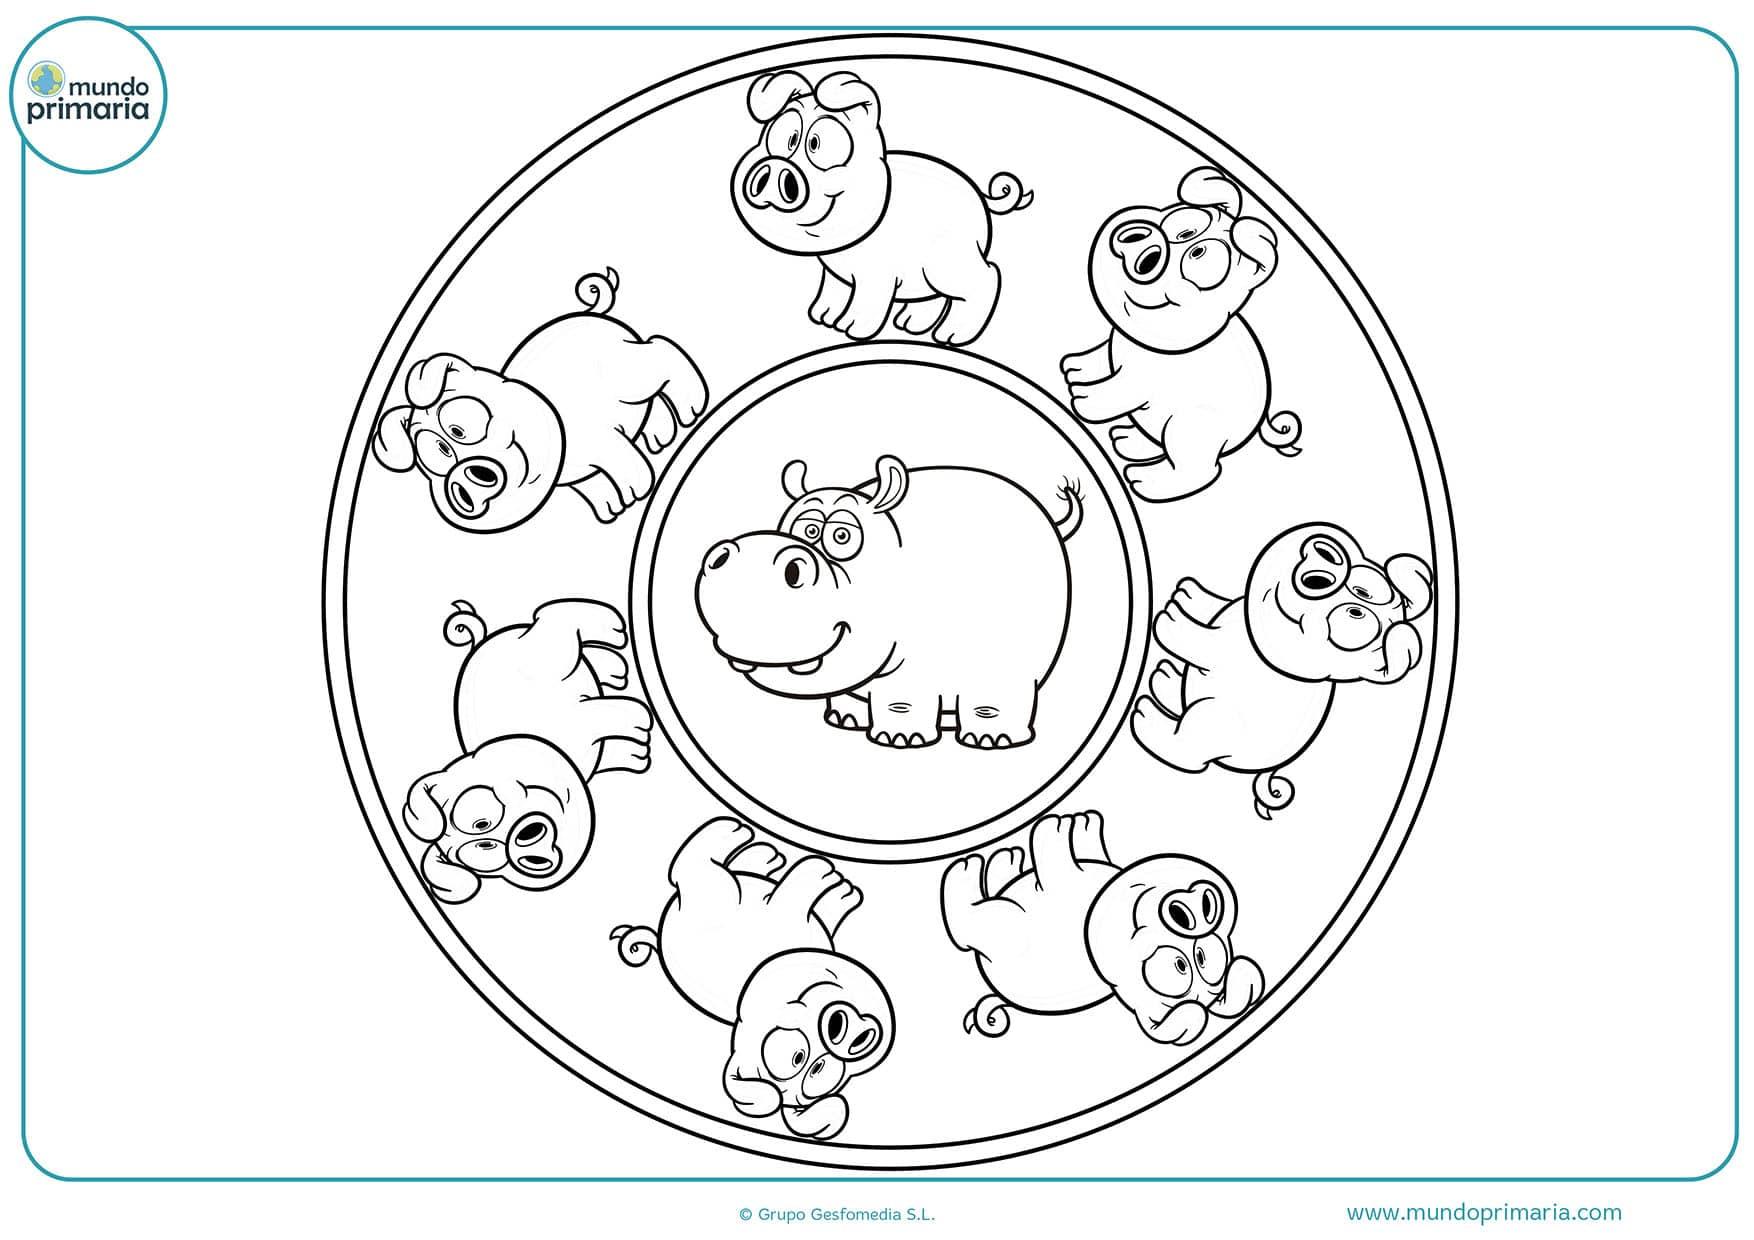 Colorear dibujos mandalas animales gratis